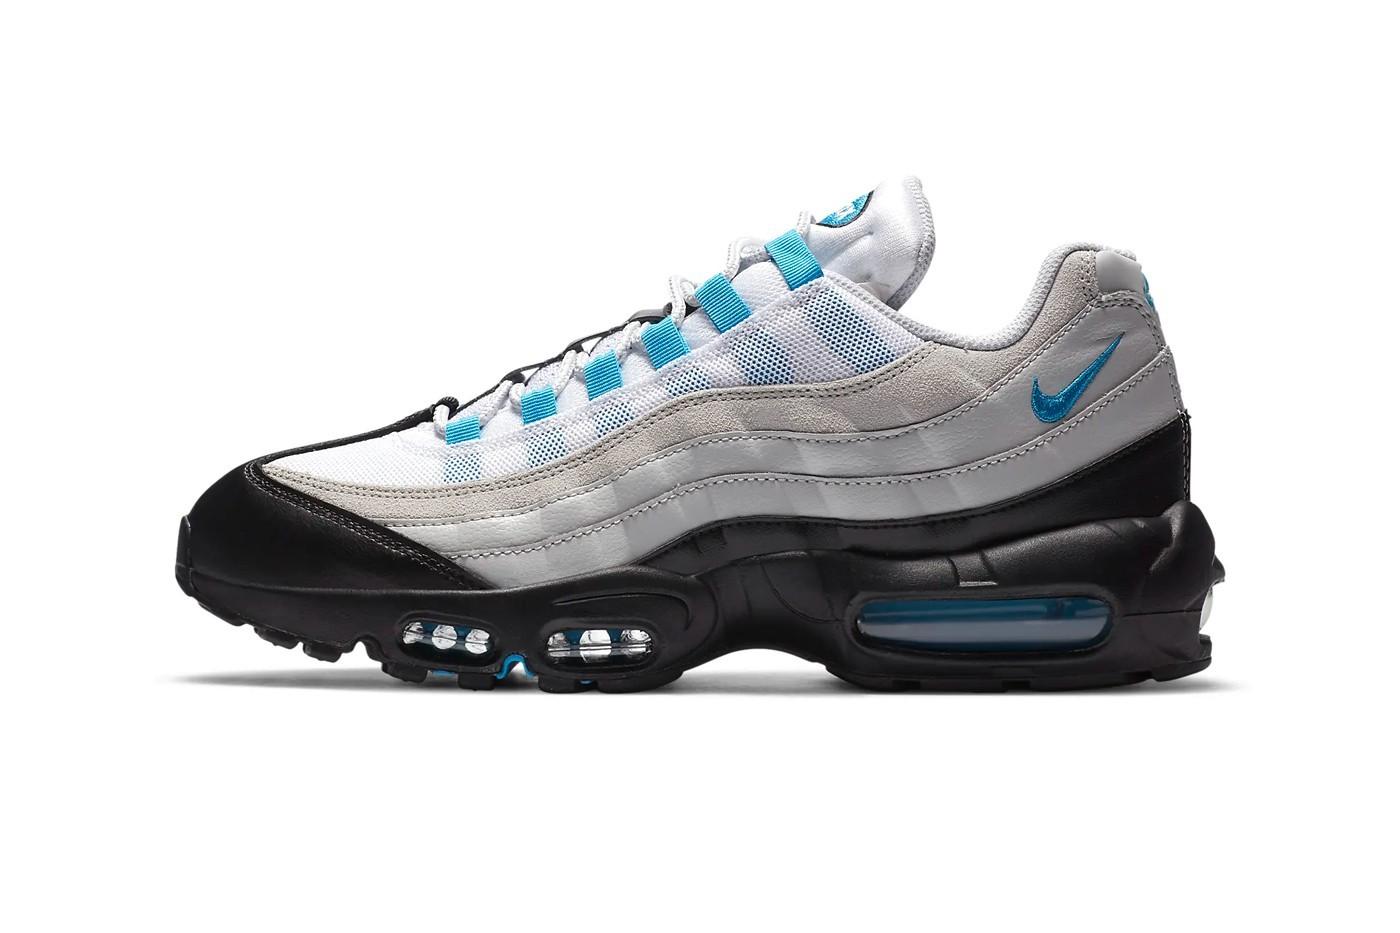 "耐克 Nike Air Max 95 发布"" Laser Blue""配色版"